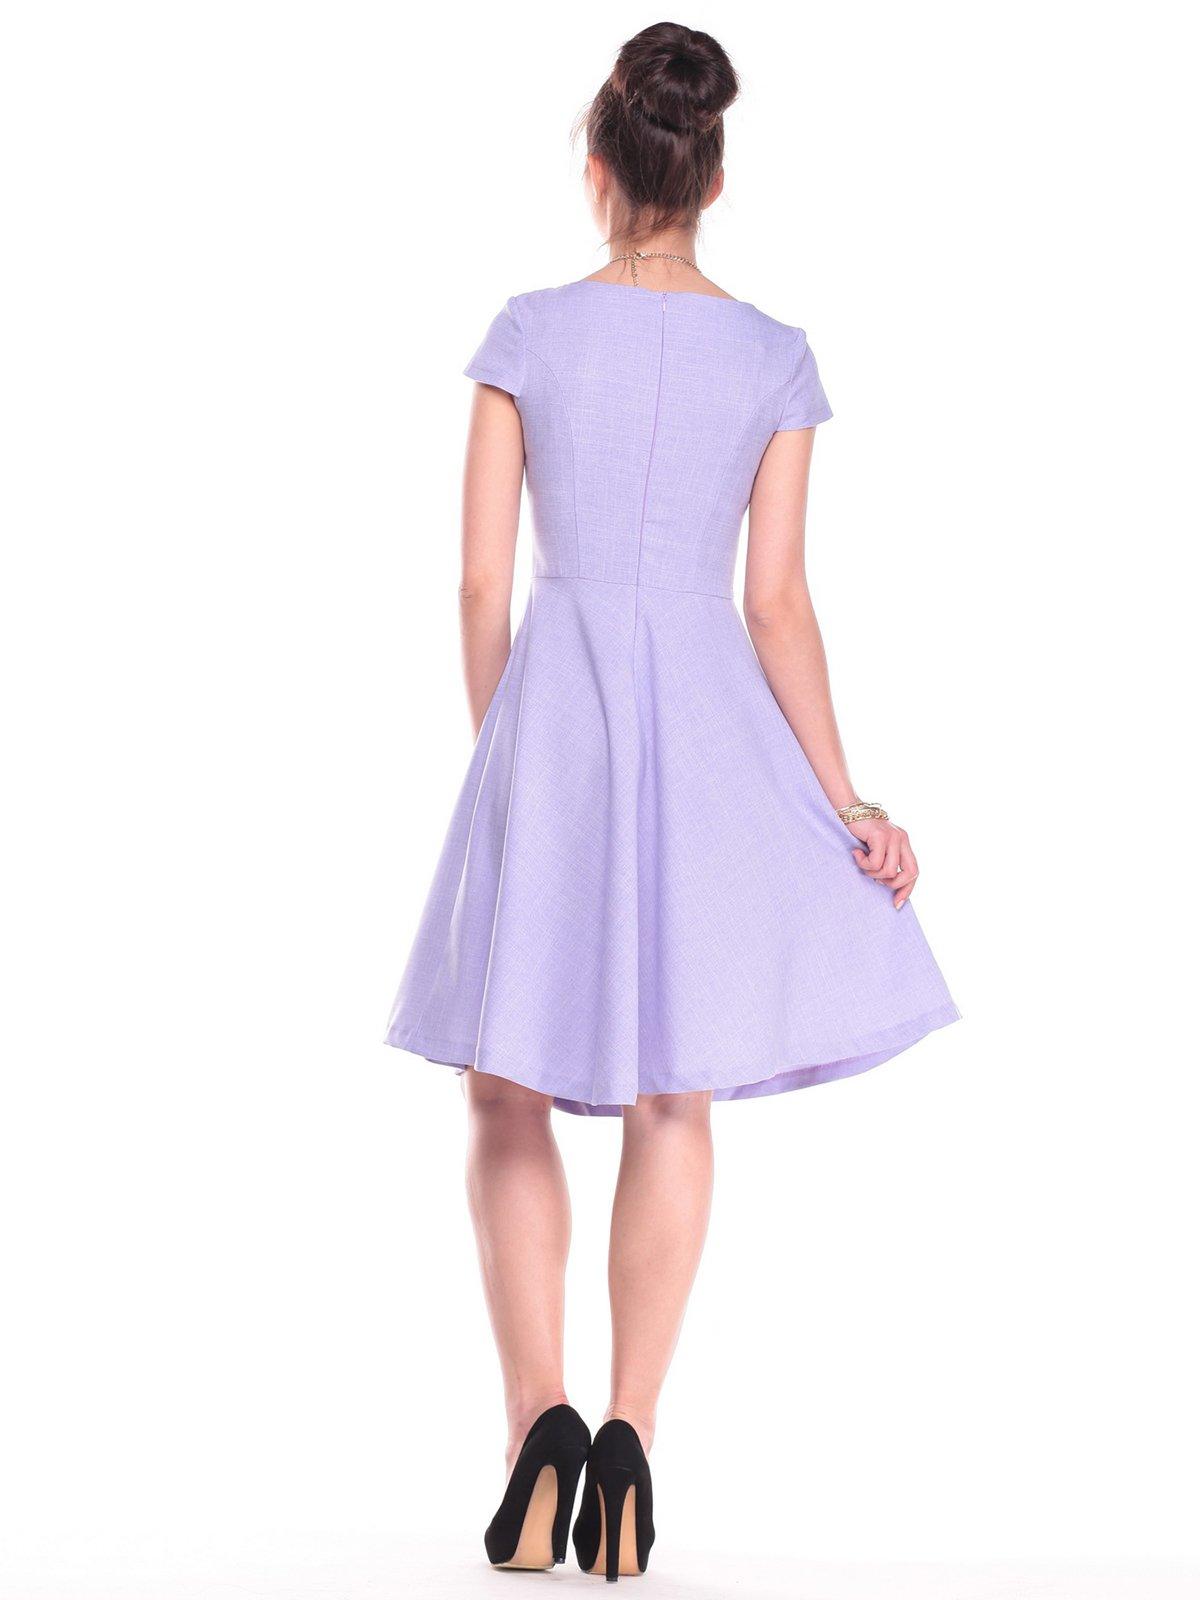 Платье сиреневое | 2387804 | фото 2